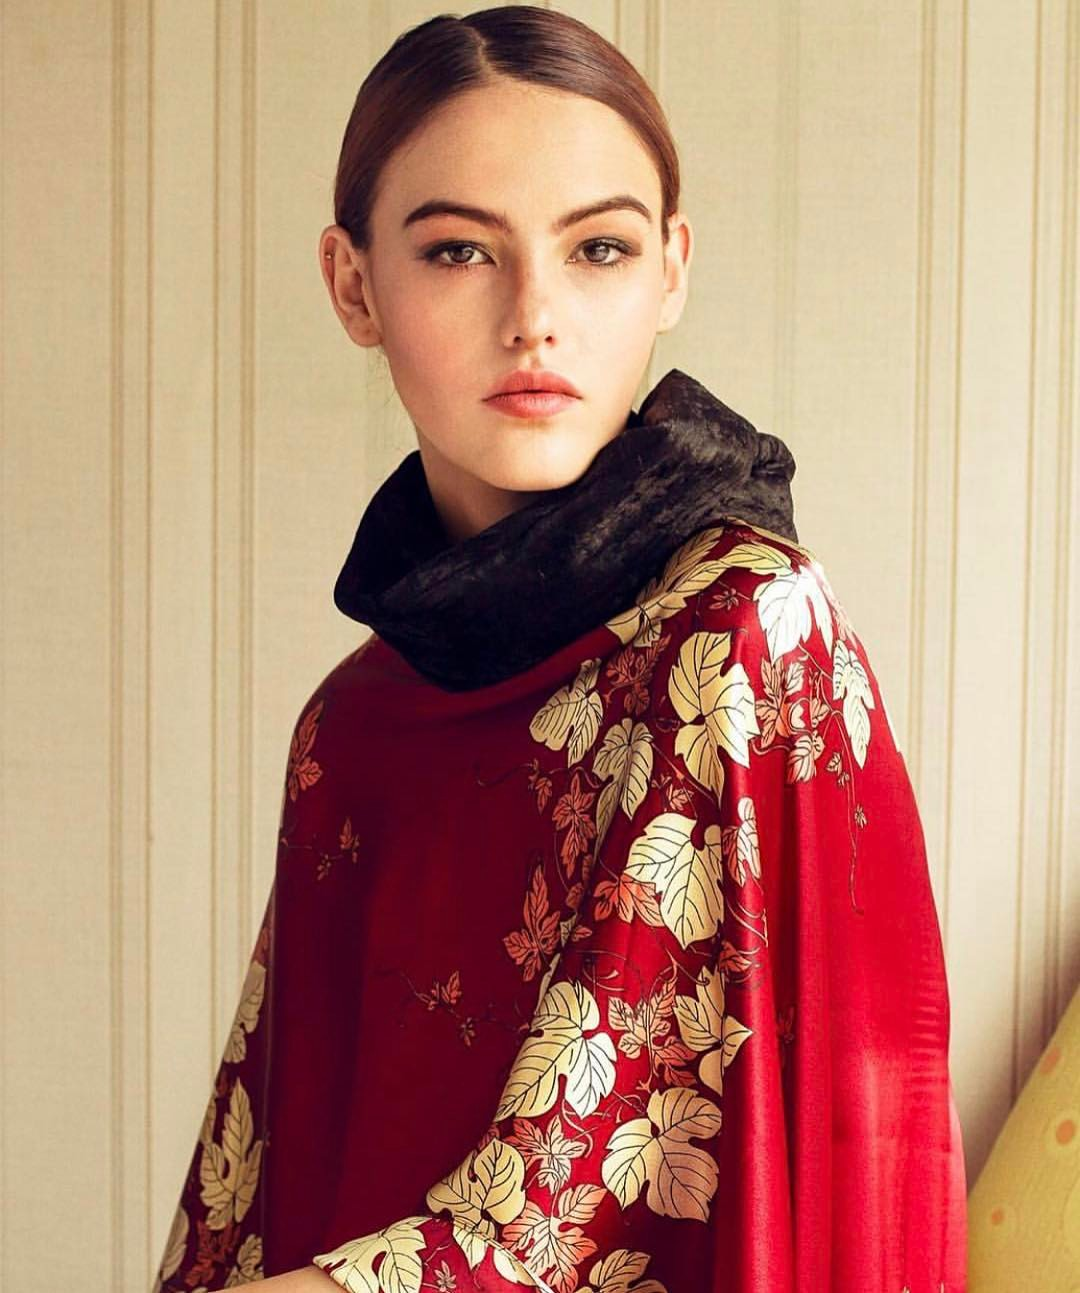 @gloria_fashiondesign